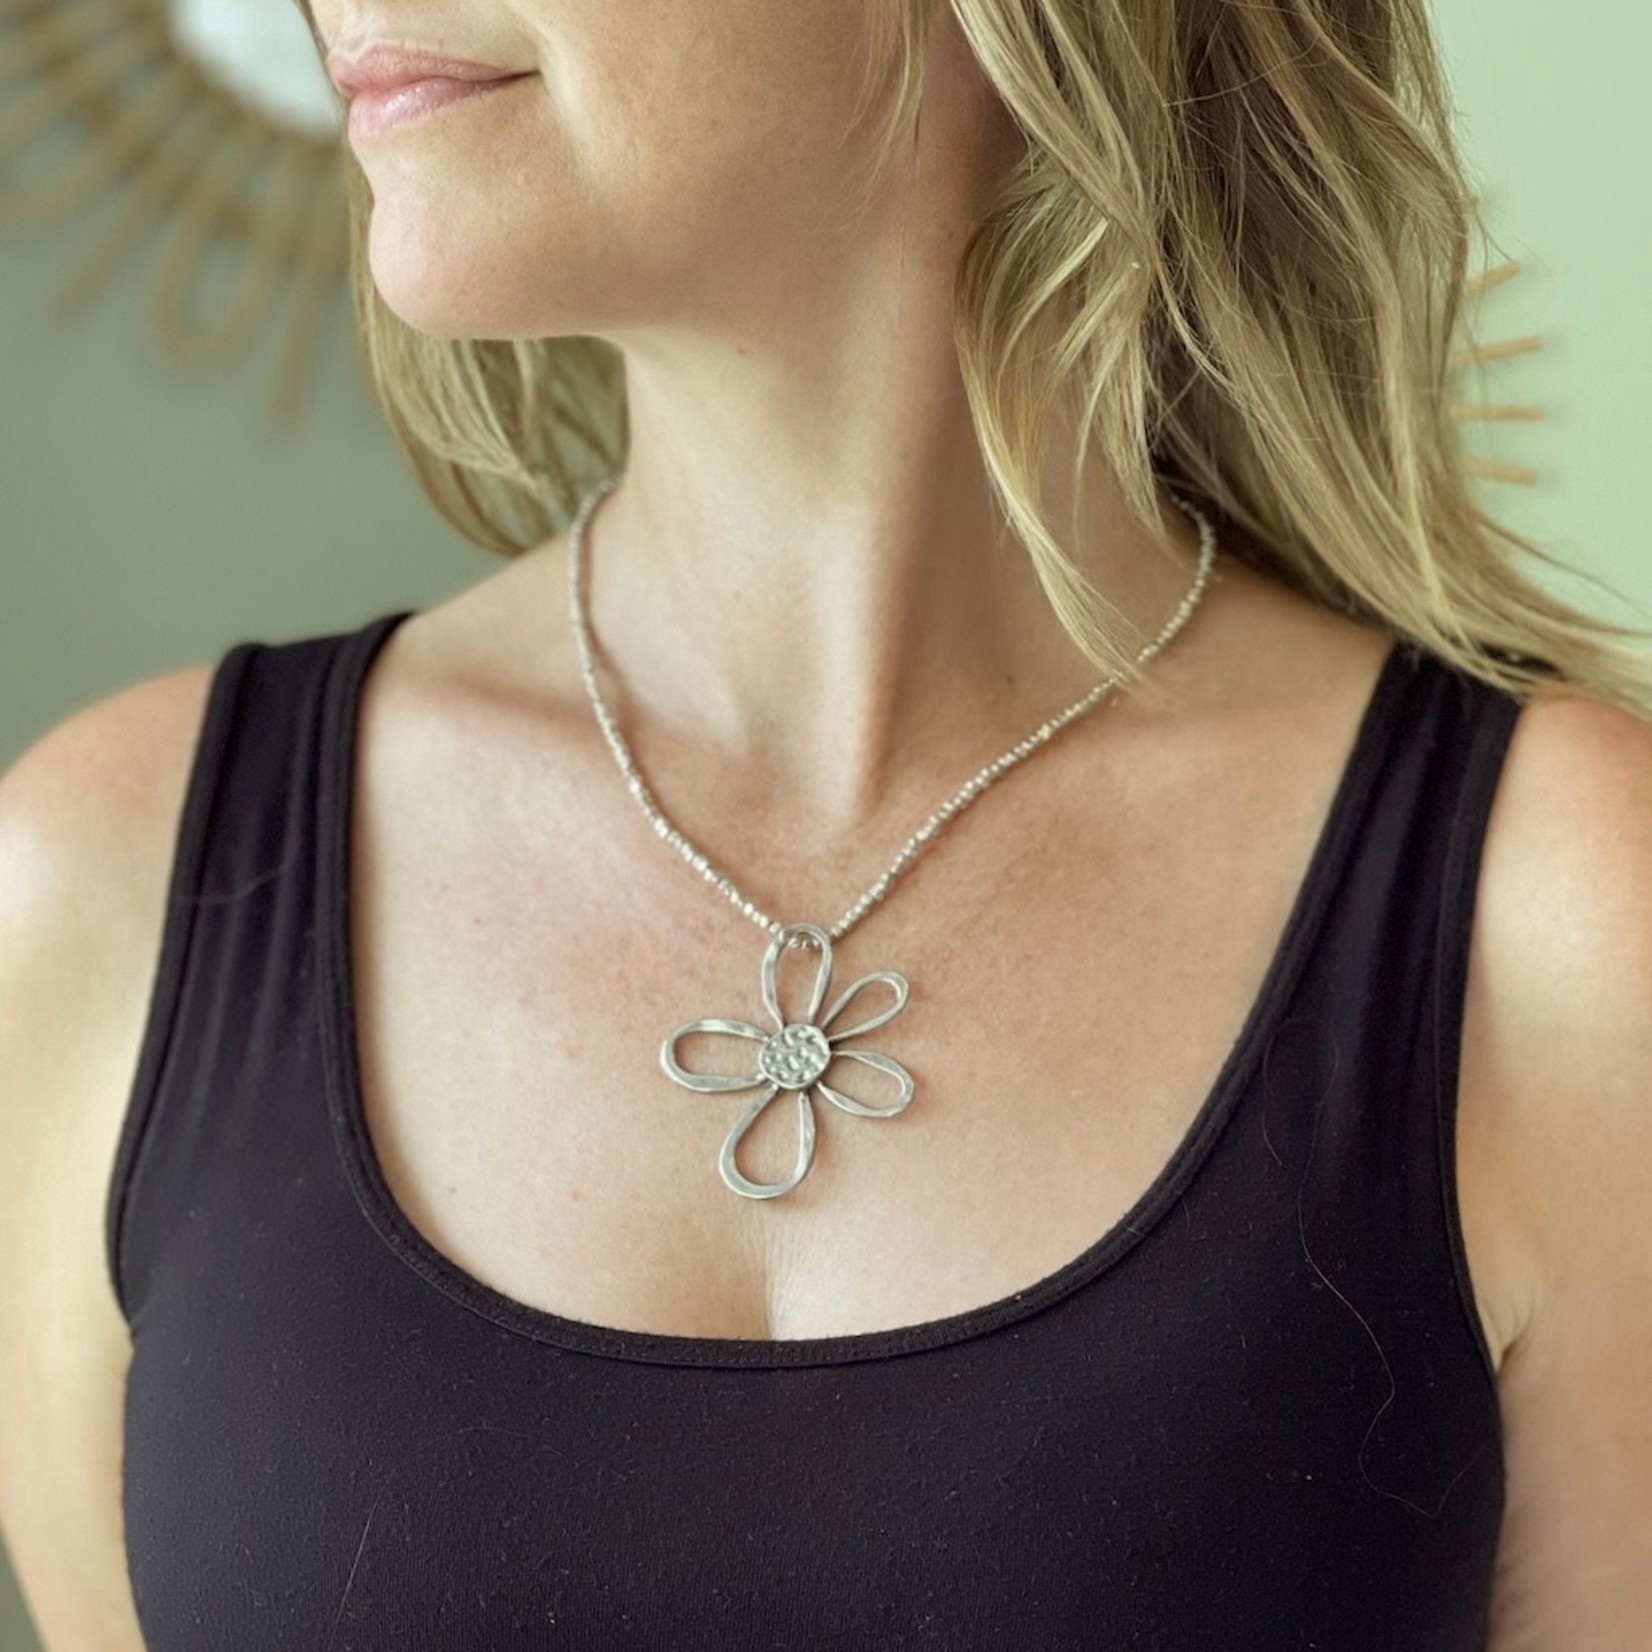 Suzie Blue Canada Open Flower Necklace in Silver Plate